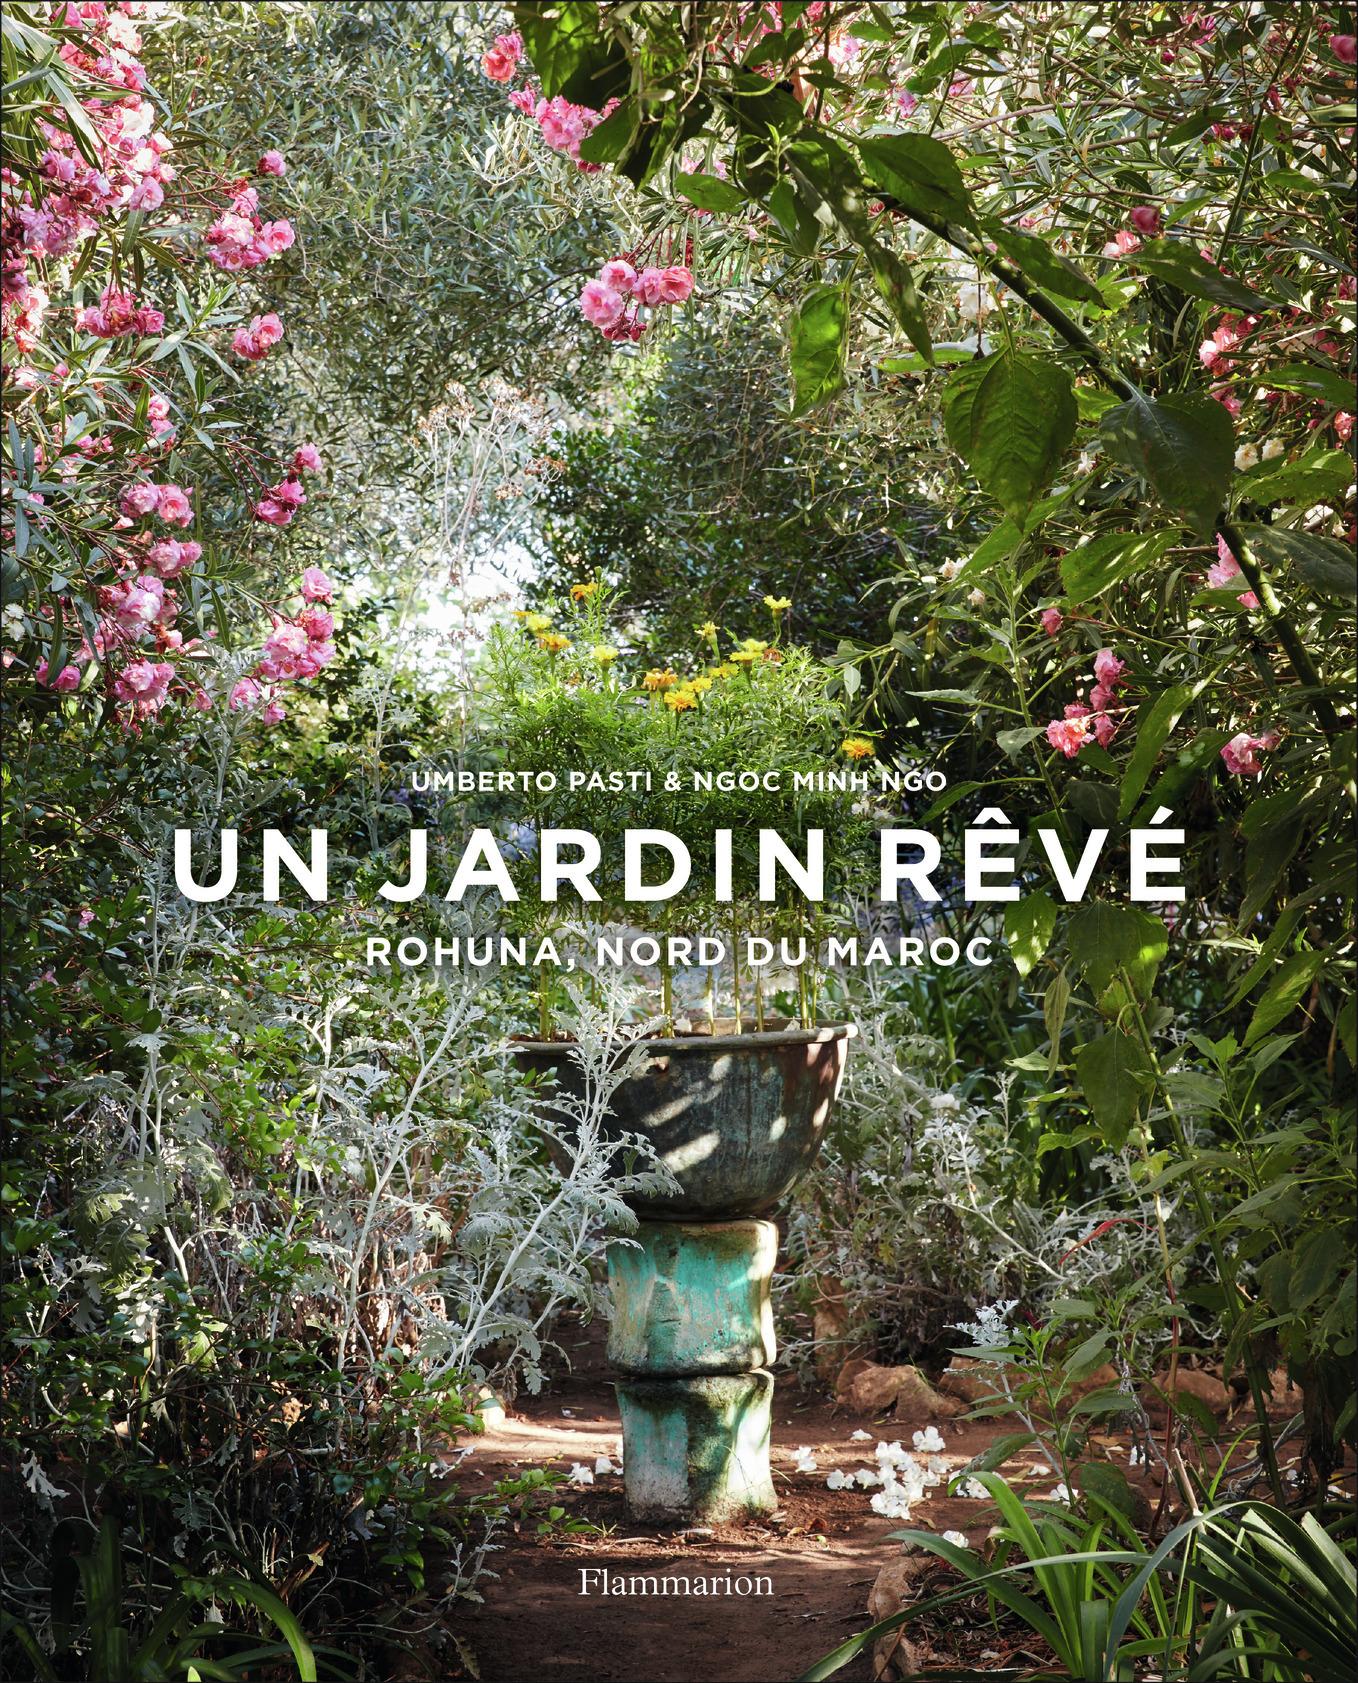 UN JARDIN REVE - ROHUNA, NORD DU MAROC